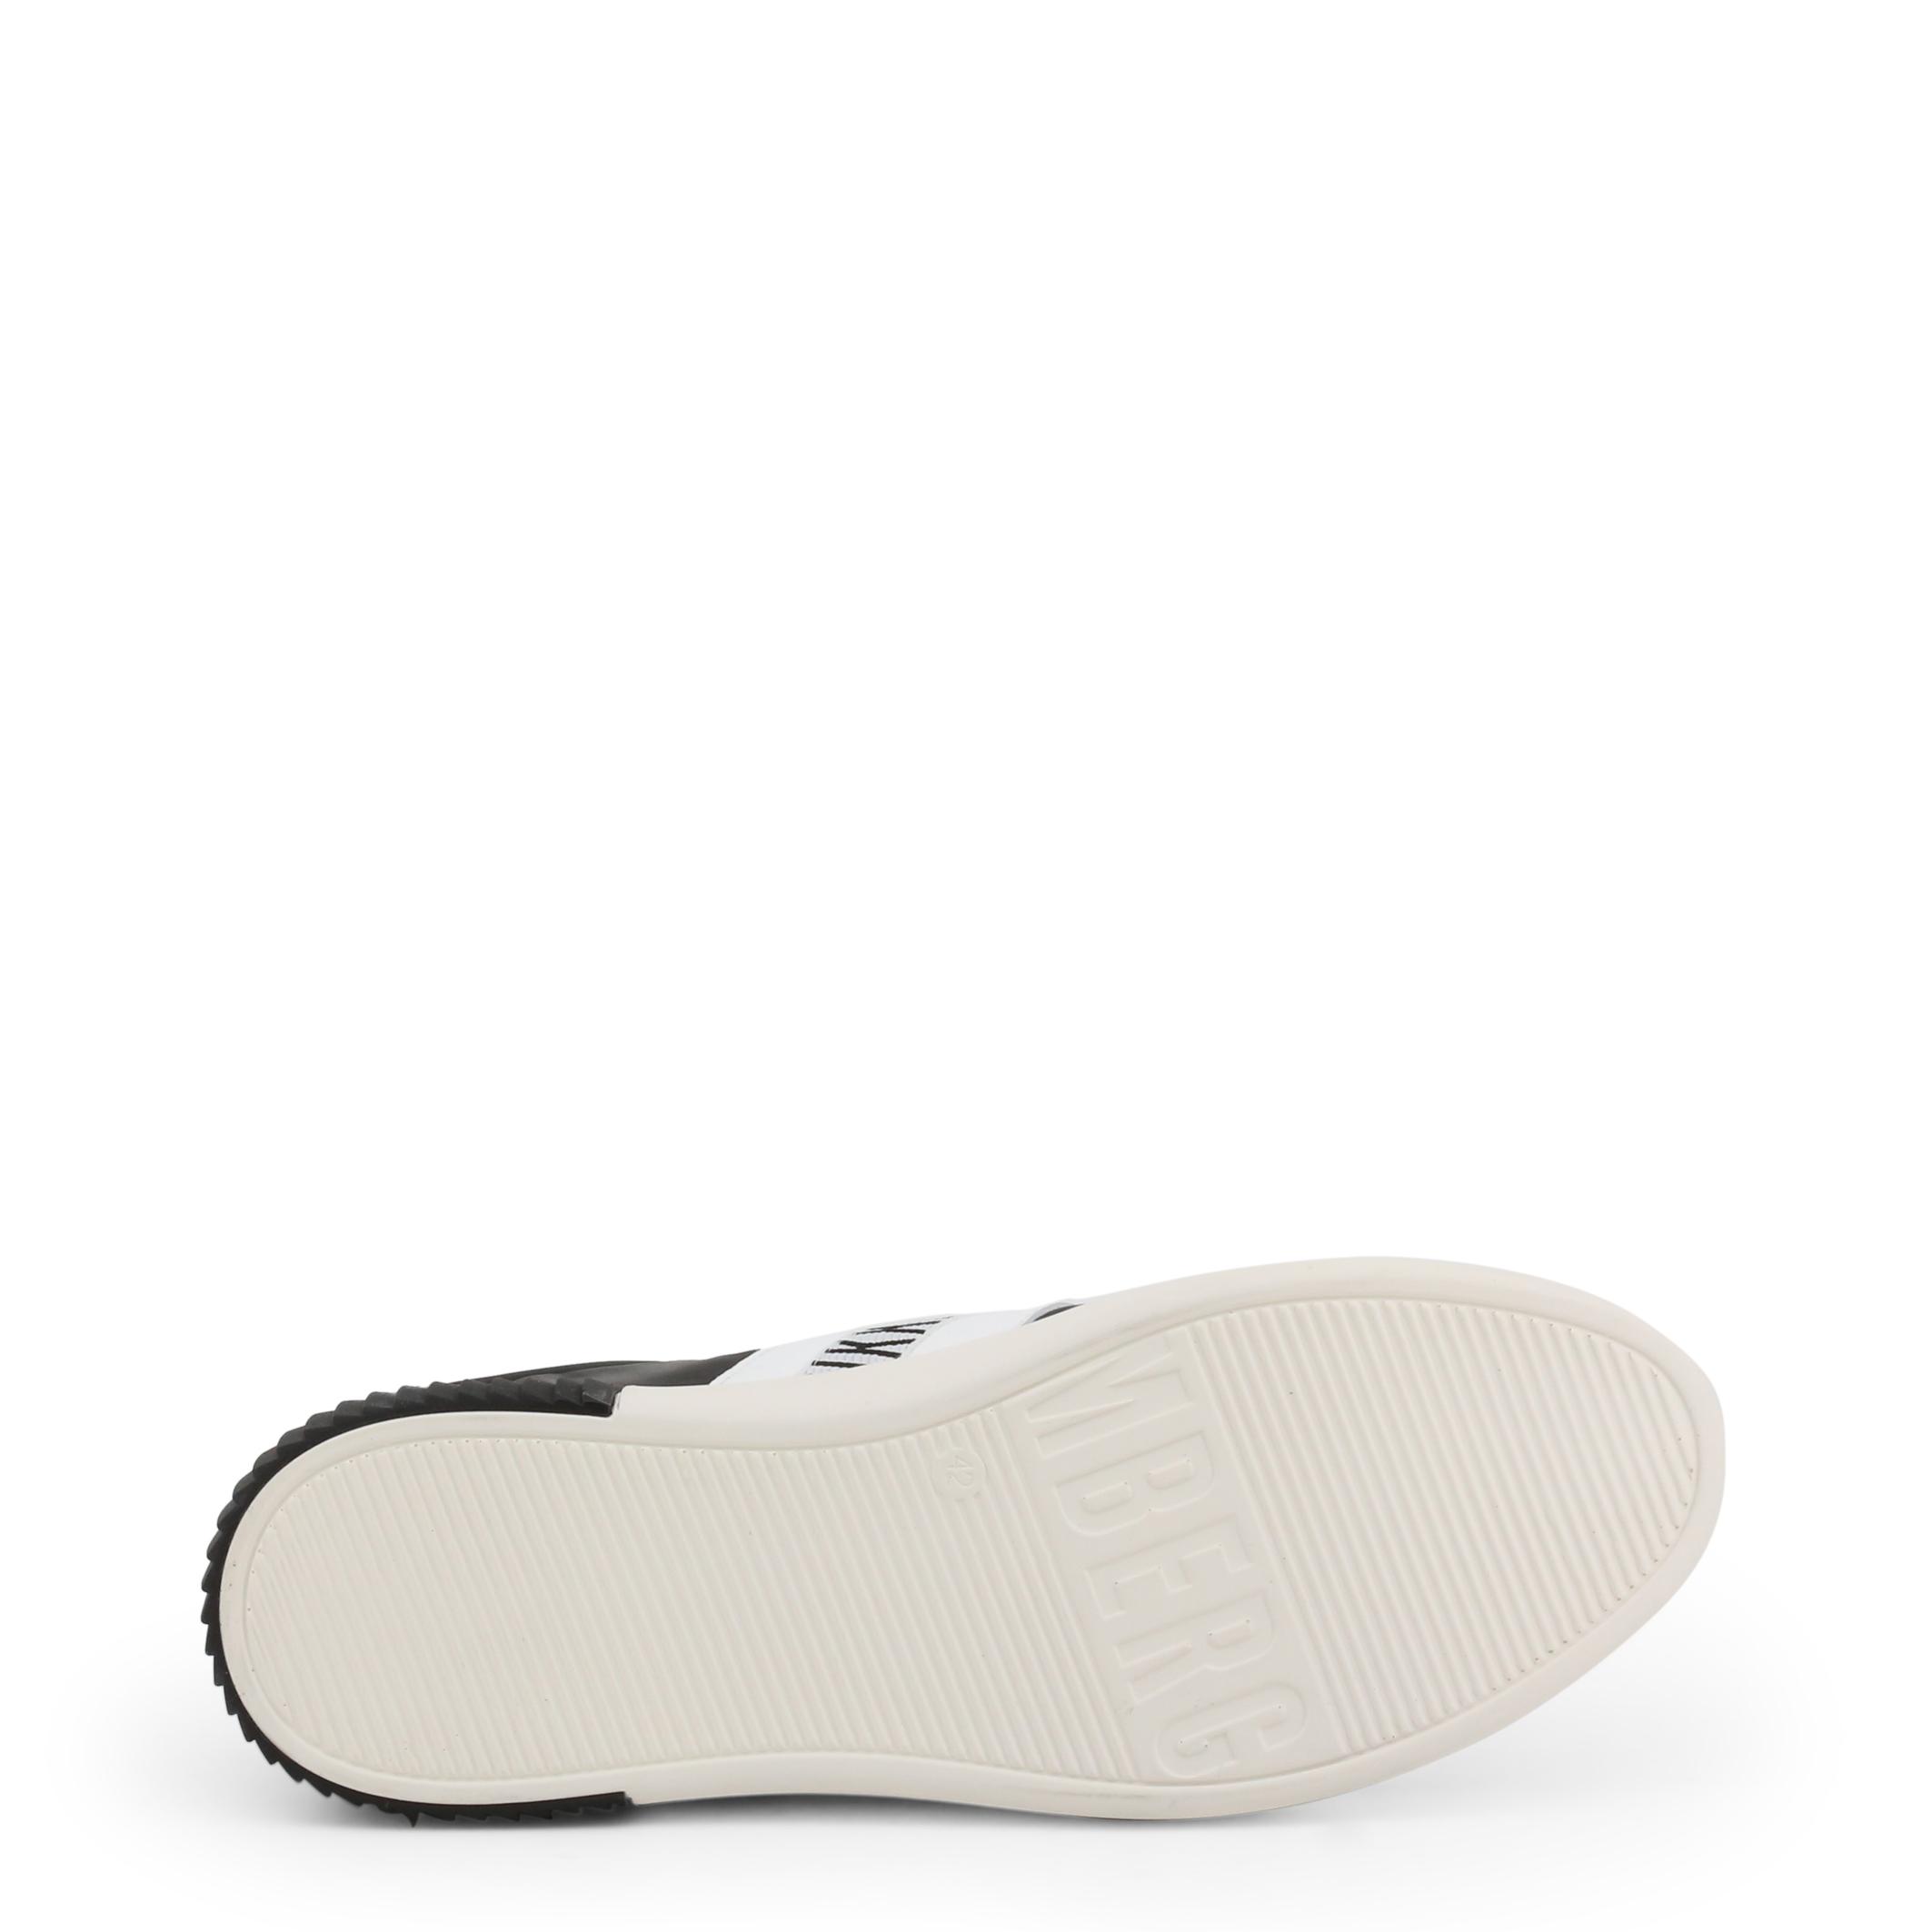 Chaussures de ville  Bikkembergs COSMOS_2434 black